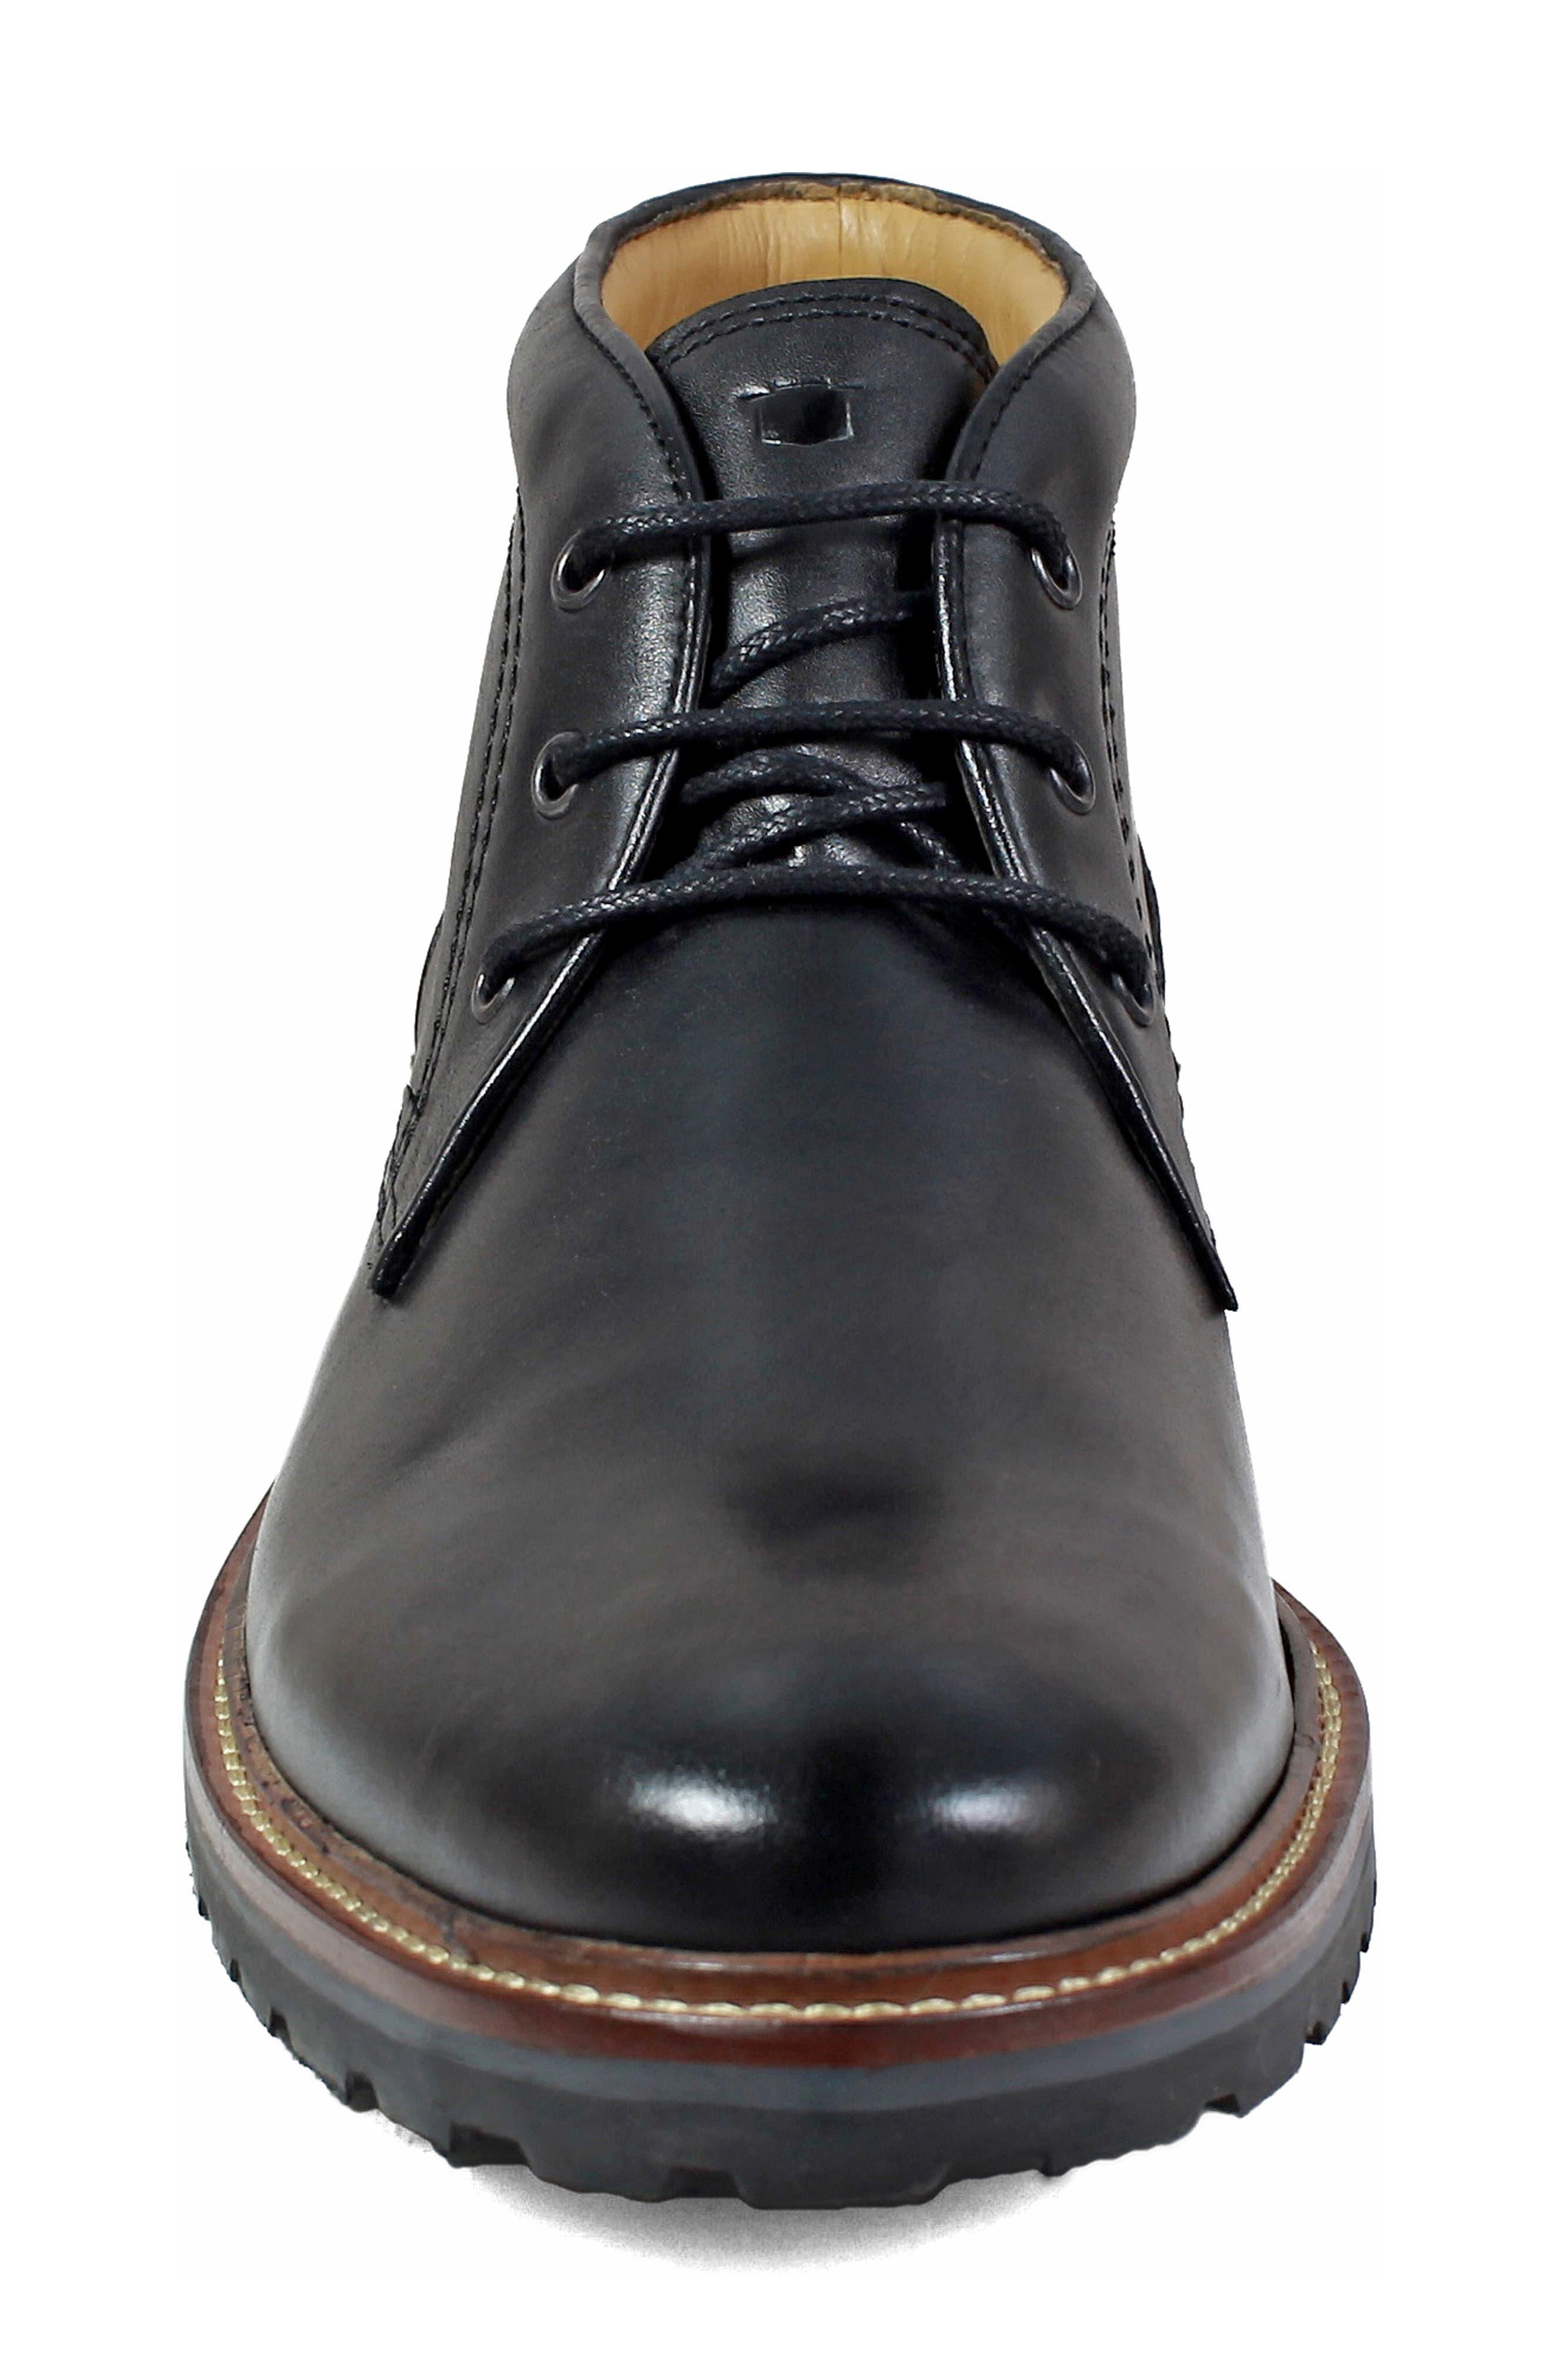 FLORSHEIM, Estabrook Lugged Chukka Boot, Alternate thumbnail 4, color, BLACK LEATHER